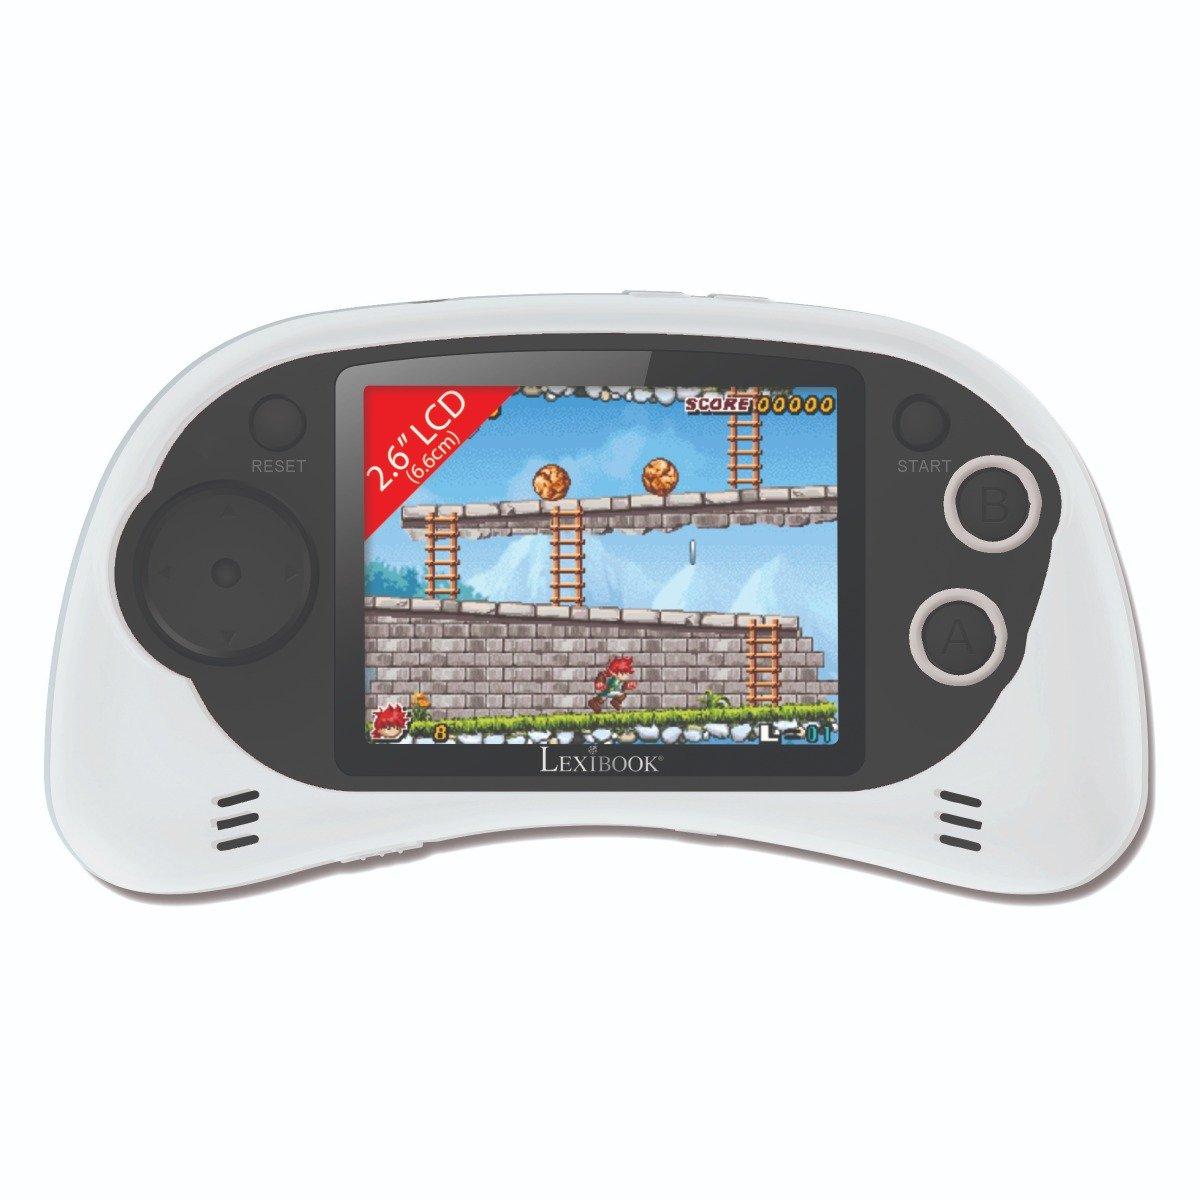 Consola portabila Cyber Arcade Lexibook, 200 jocuri